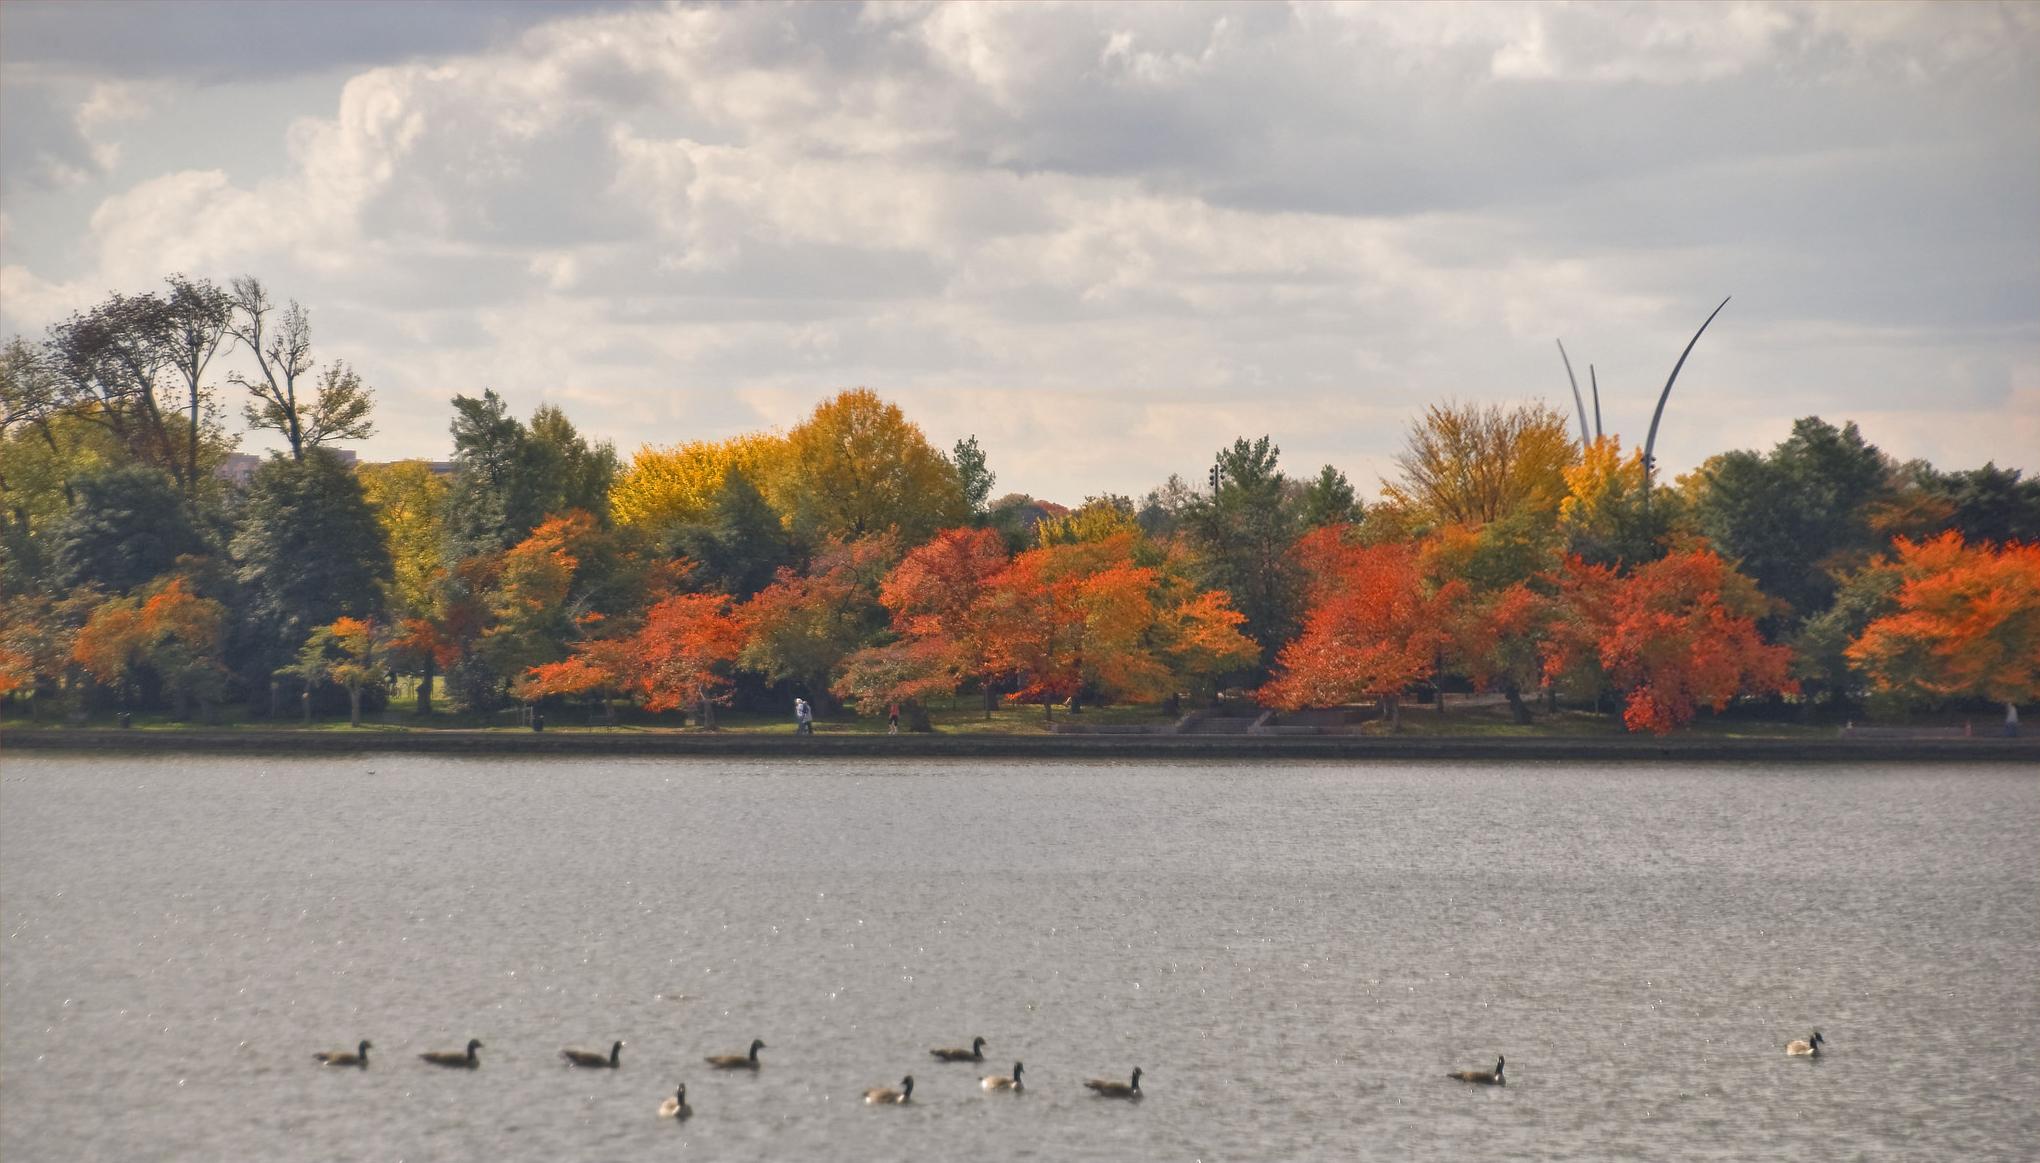 Autumnal landscape, Washington DC.  Image (CC) Ron Cogswell